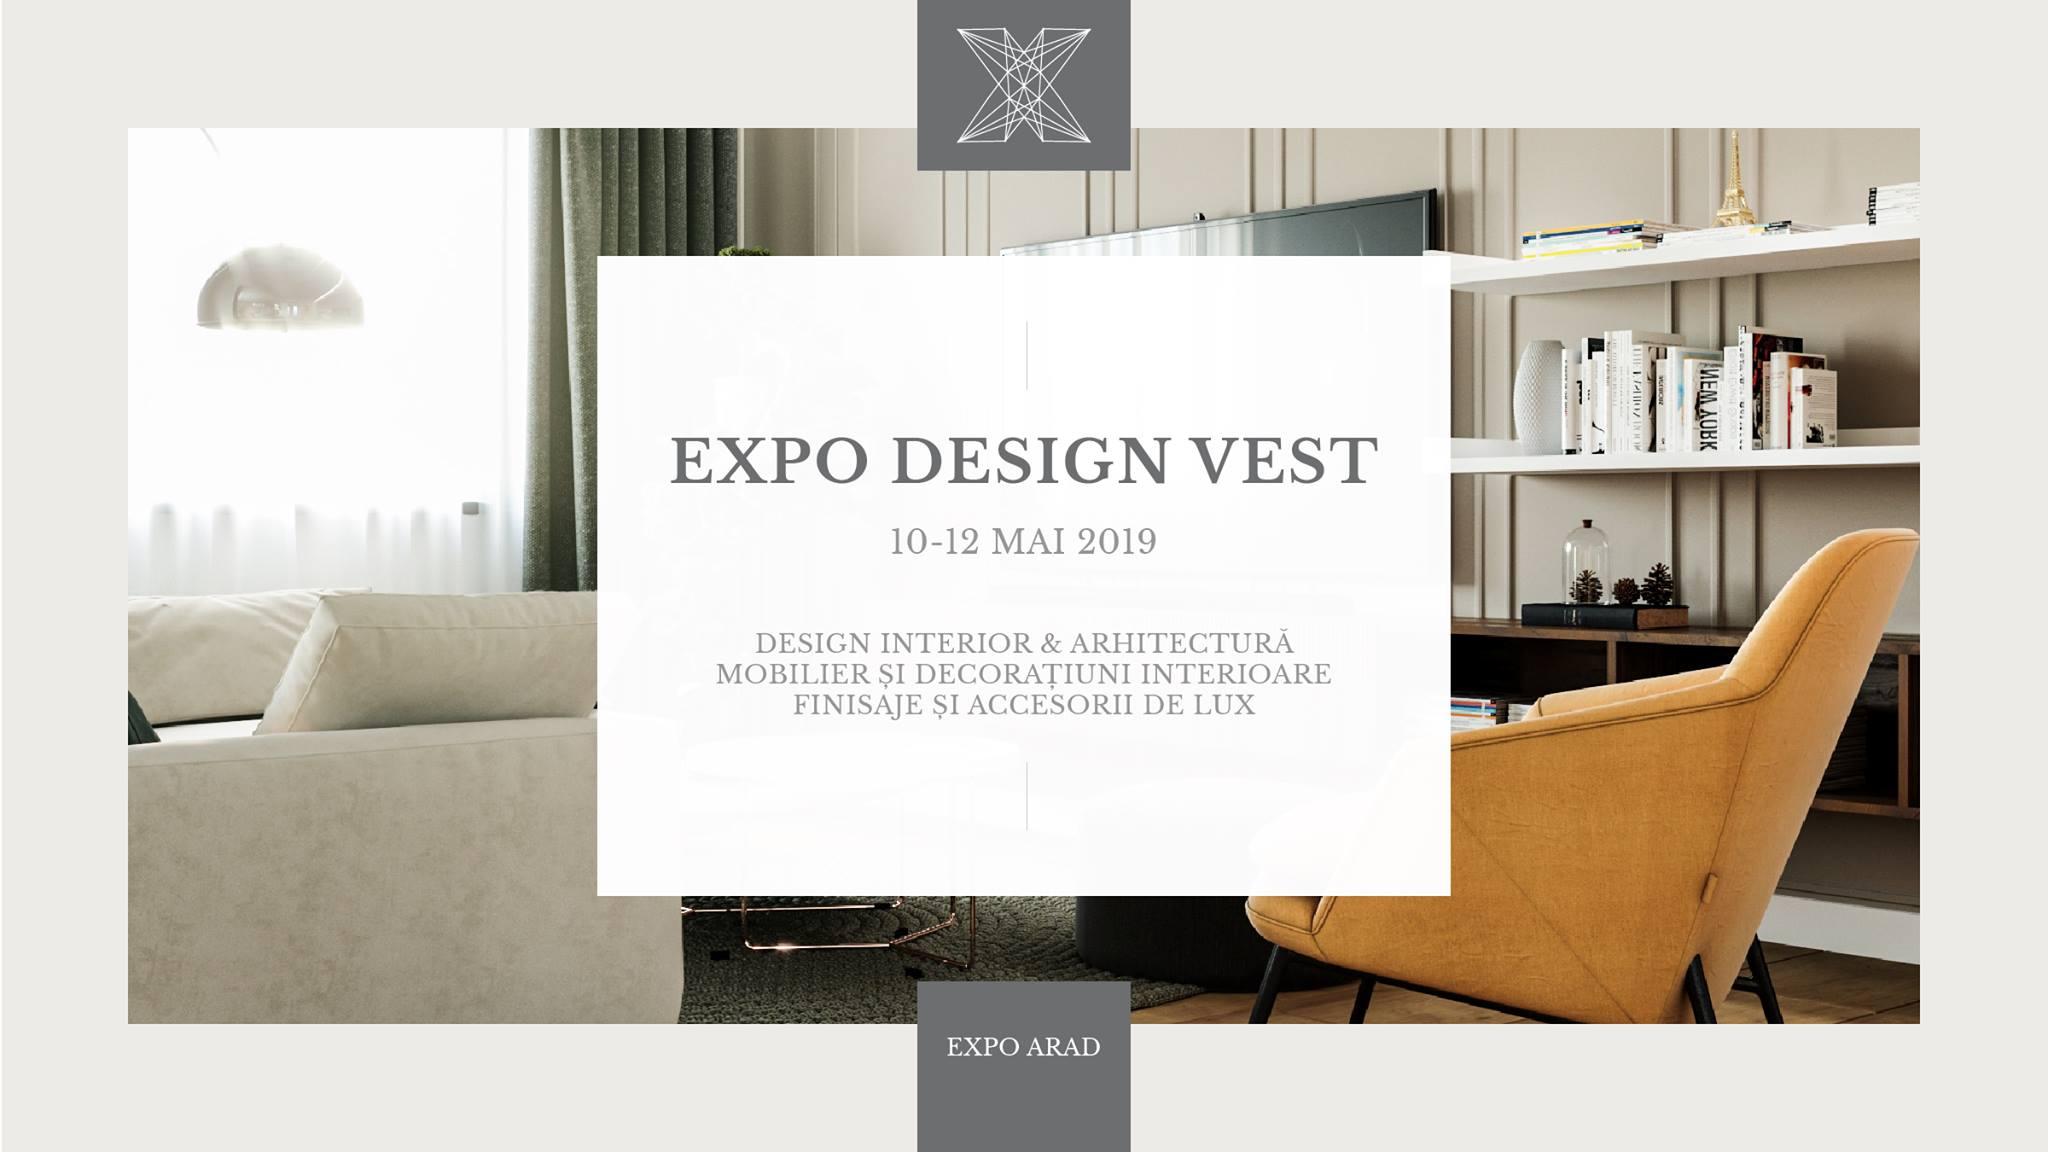 Expo Design Vest 2019